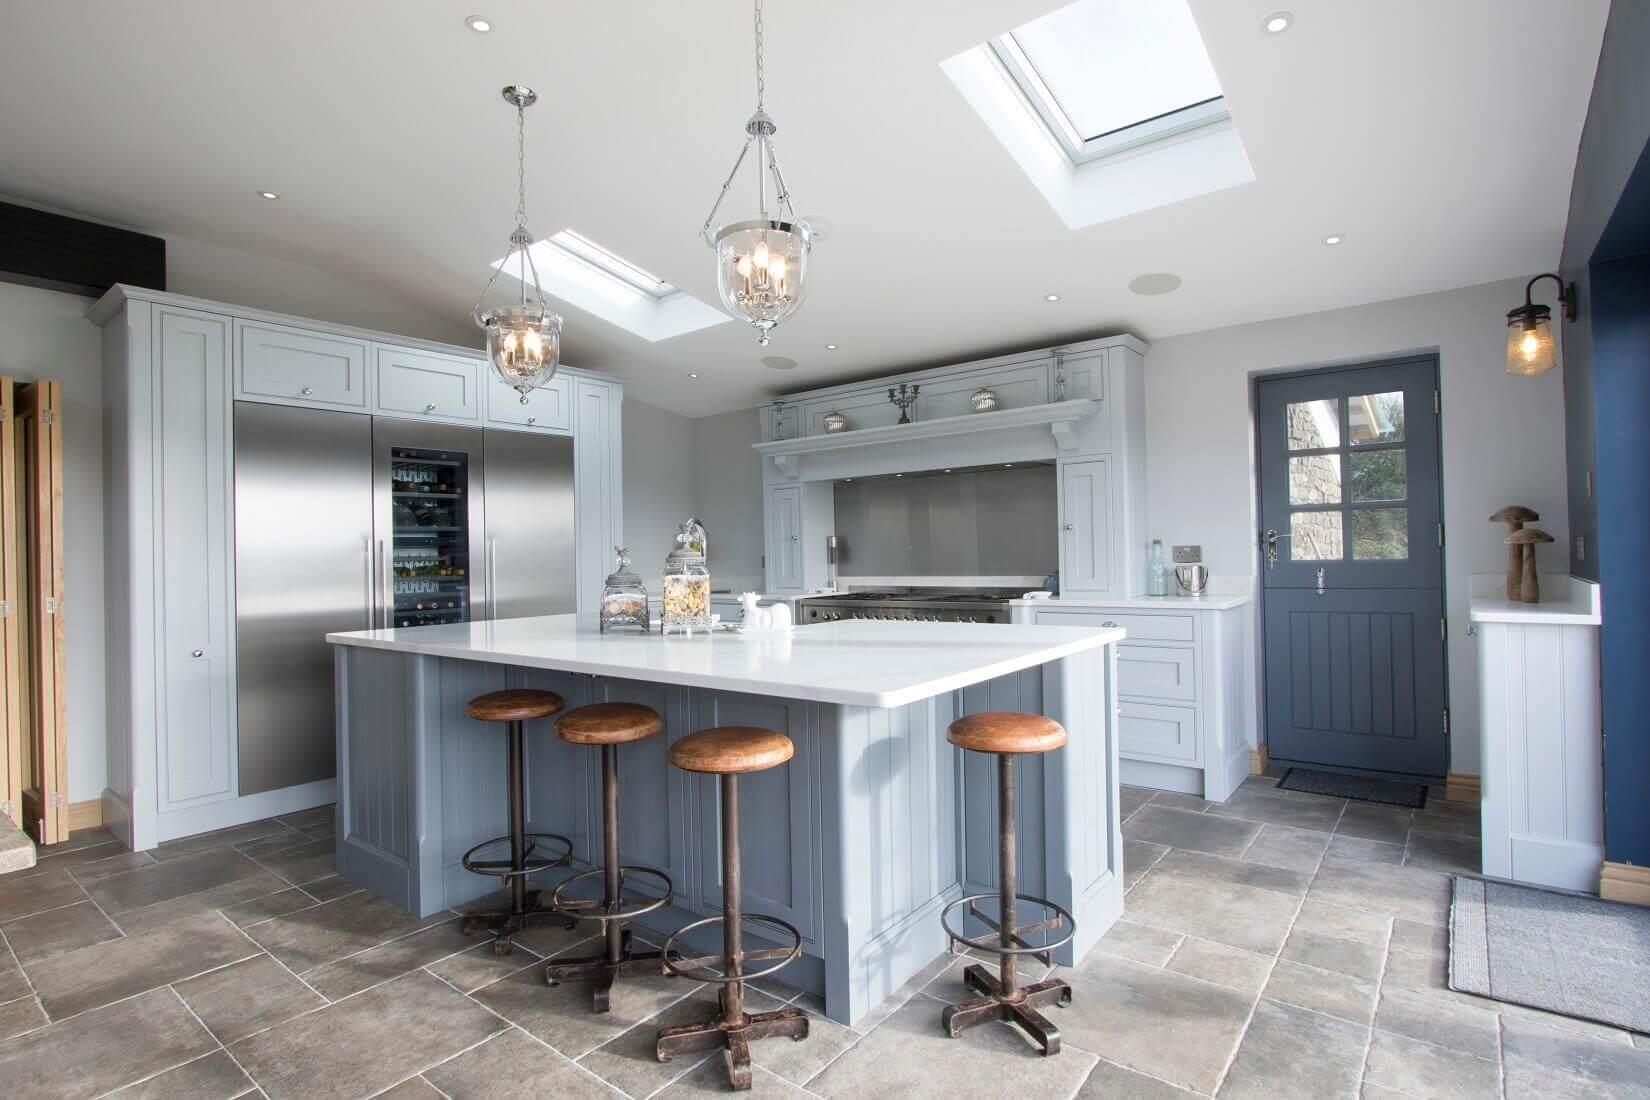 JMI Bathrooms & Fitted Kitchens Bristol | Bespoke Design ...